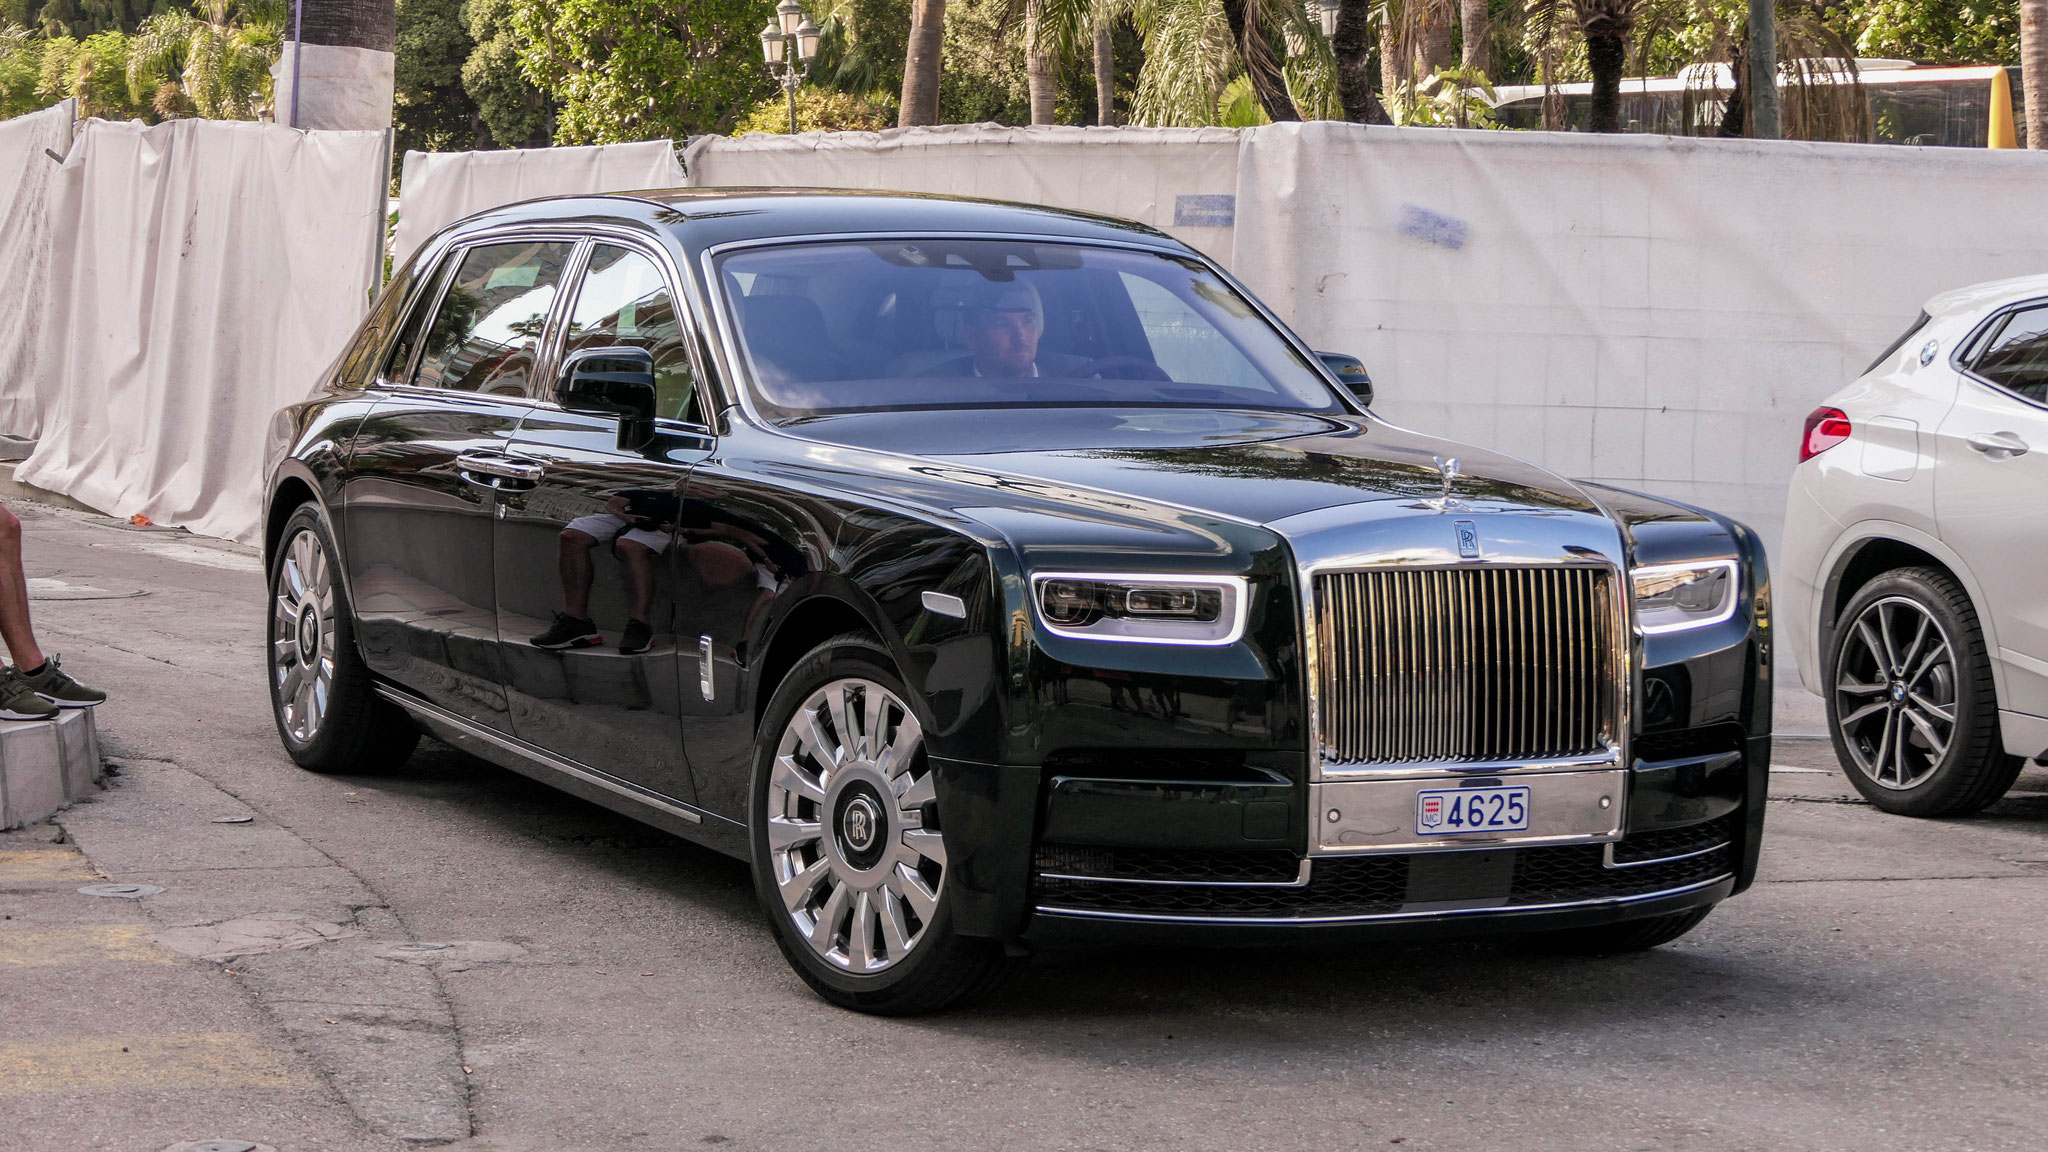 Rolls Royce Phantom - 4625 (MC)